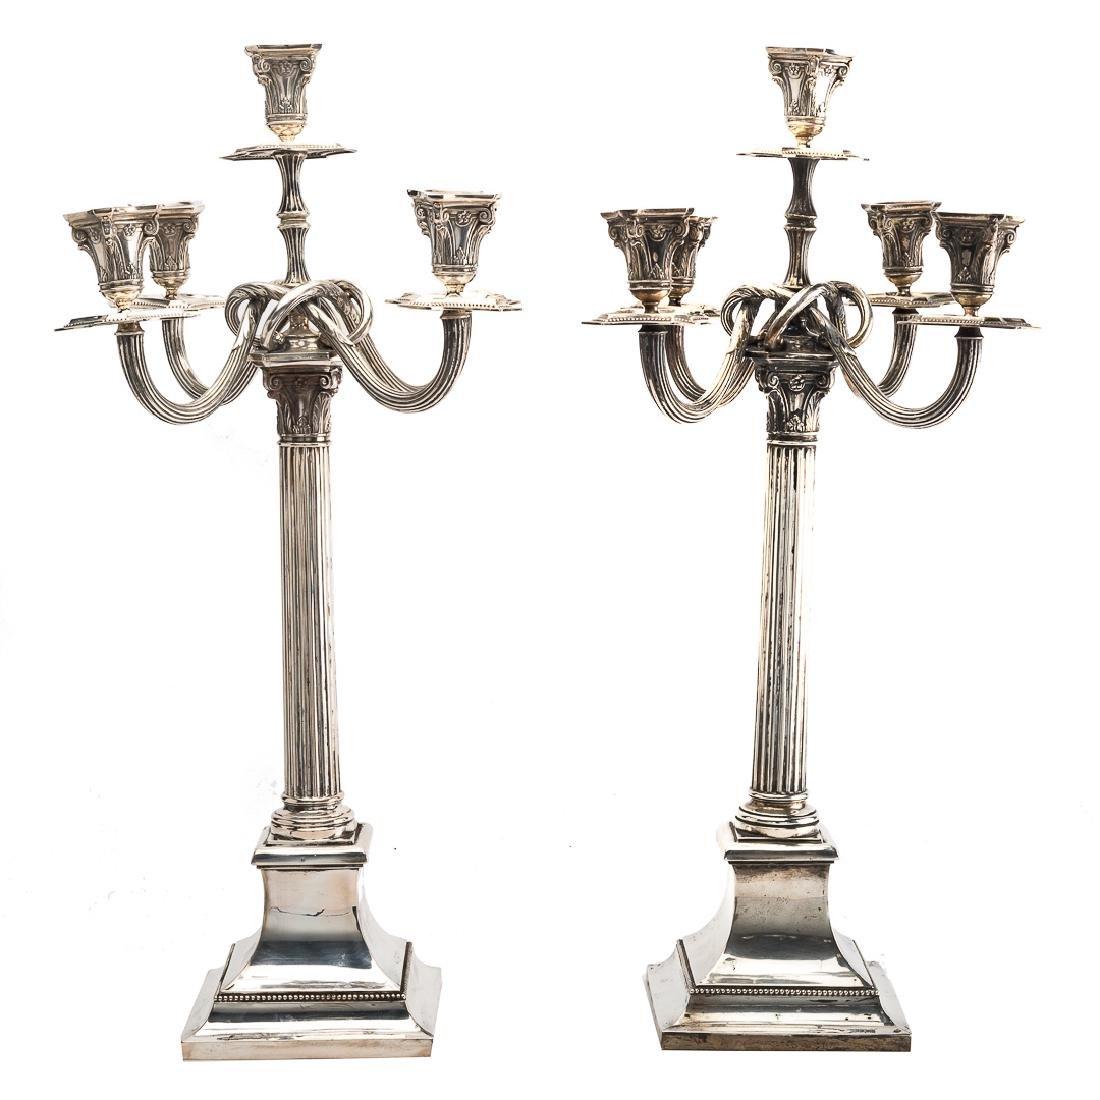 Pair of Posen silver five-light candelabra